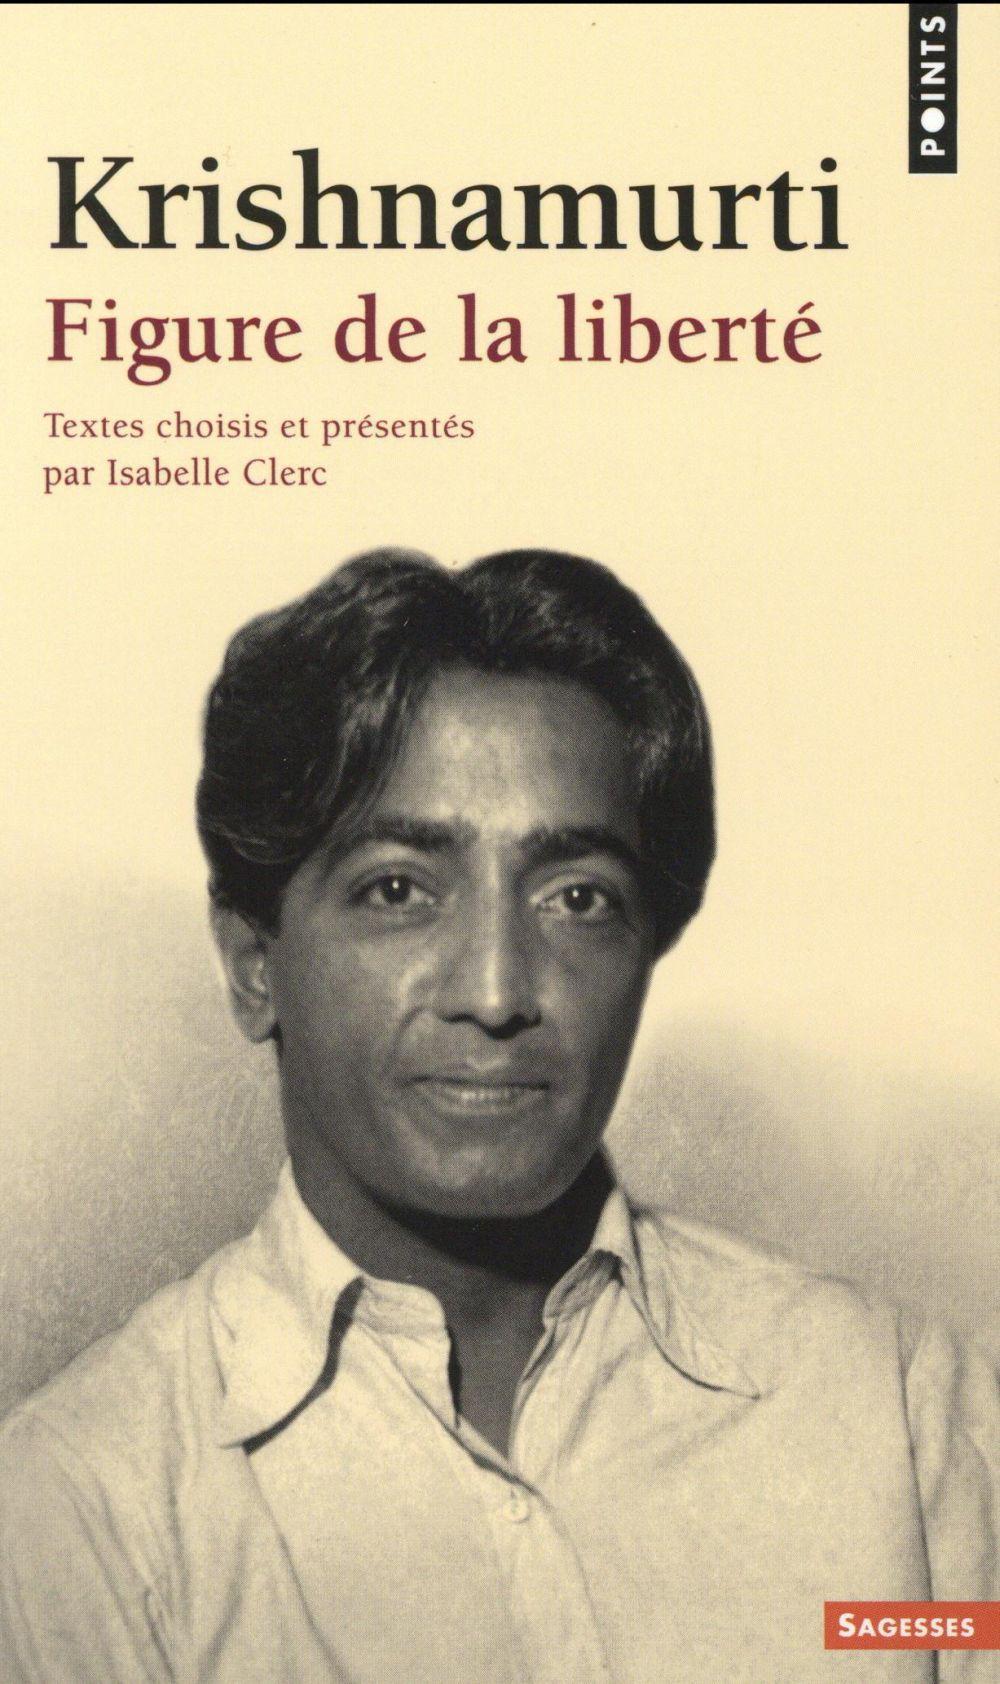 Krishnamurti, figure de la liberté